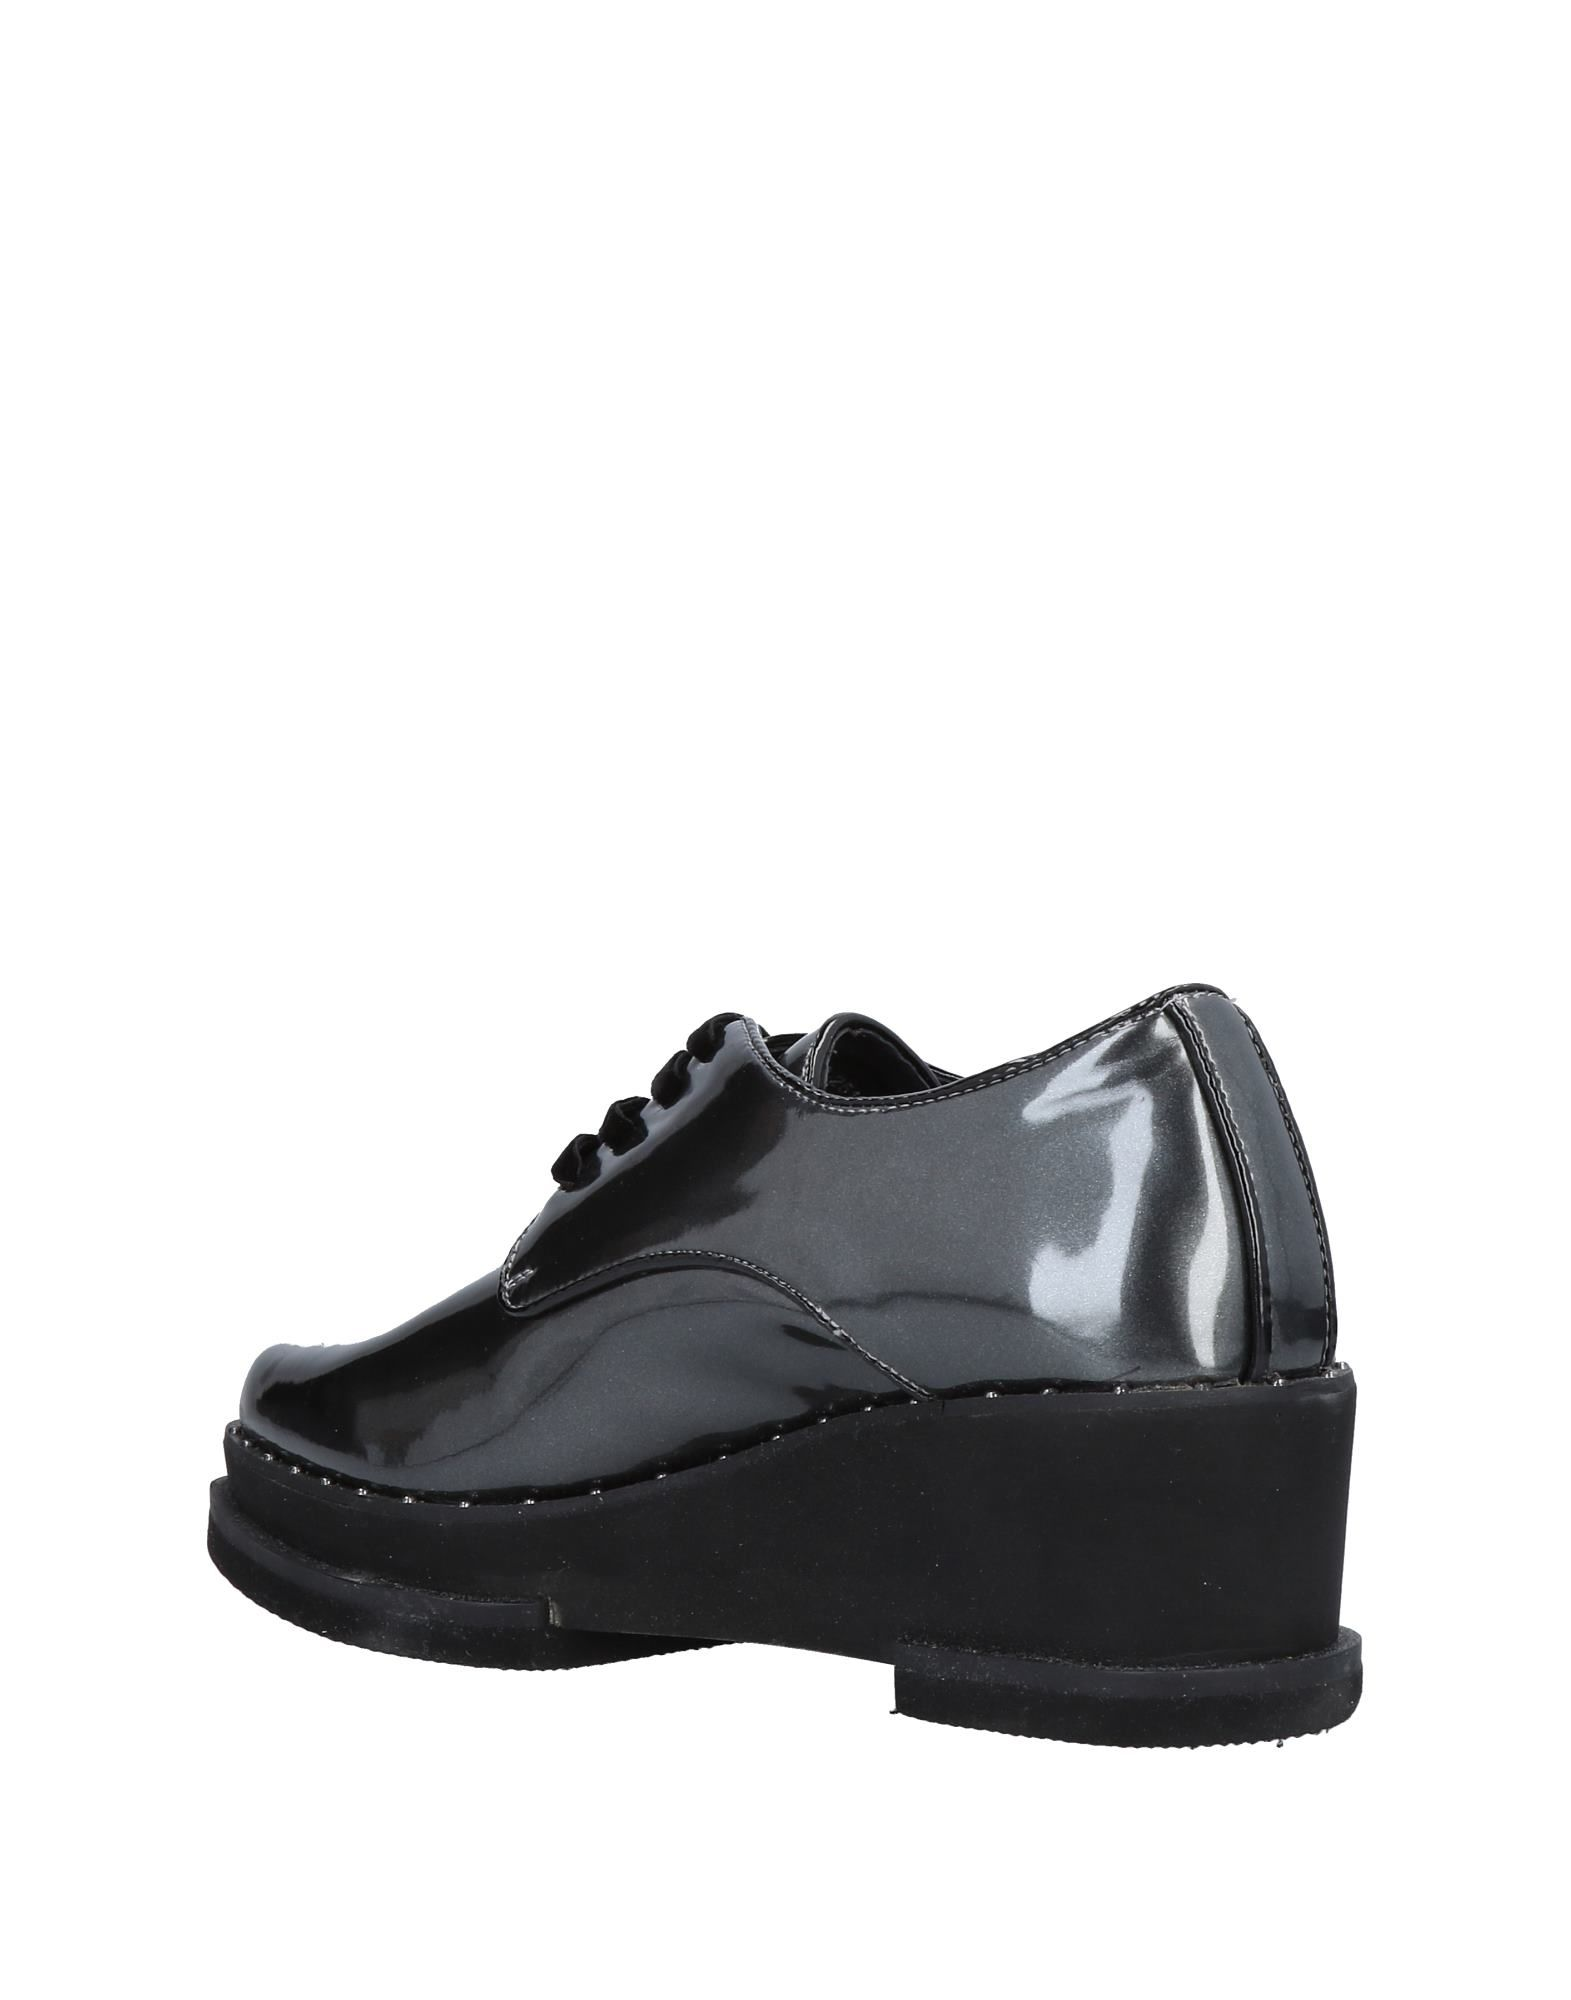 67 Sixtyseven Schnürschuhe Damen beliebte  11476241AH Gute Qualität beliebte Damen Schuhe af1817